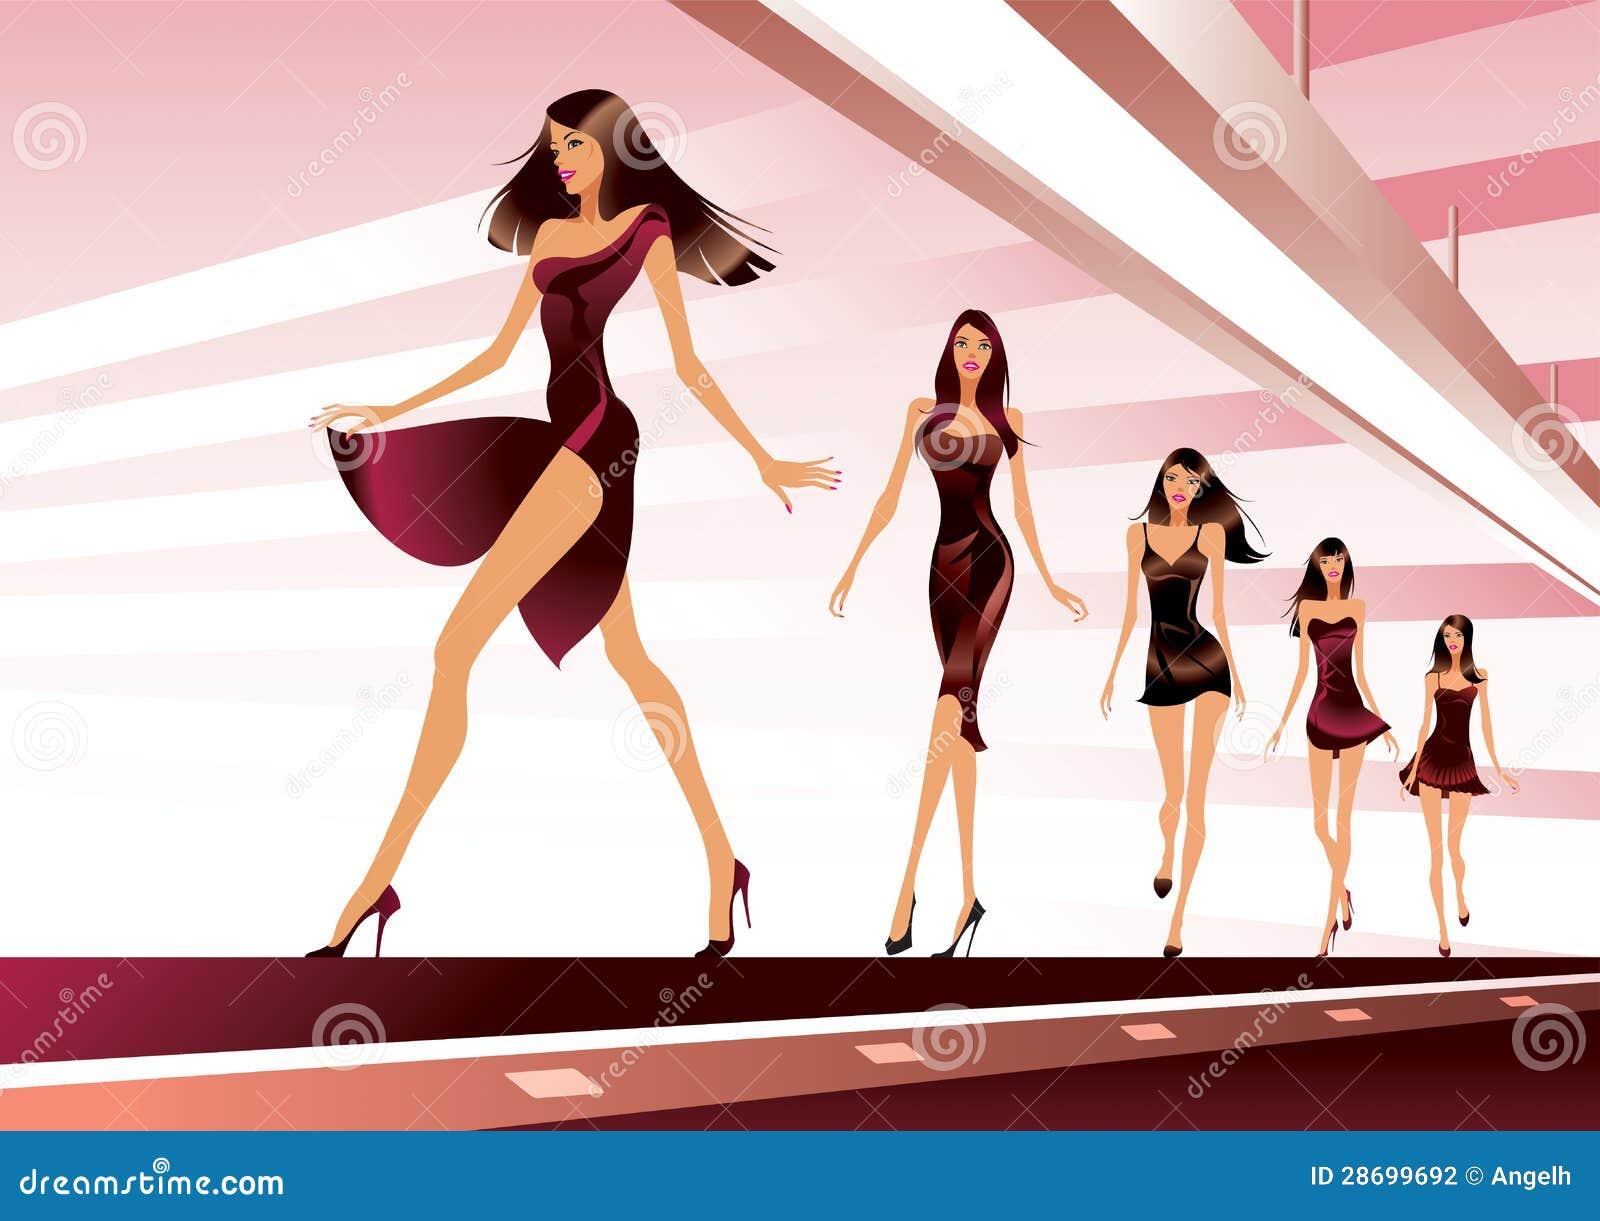 Fashion Show Runway Music Download